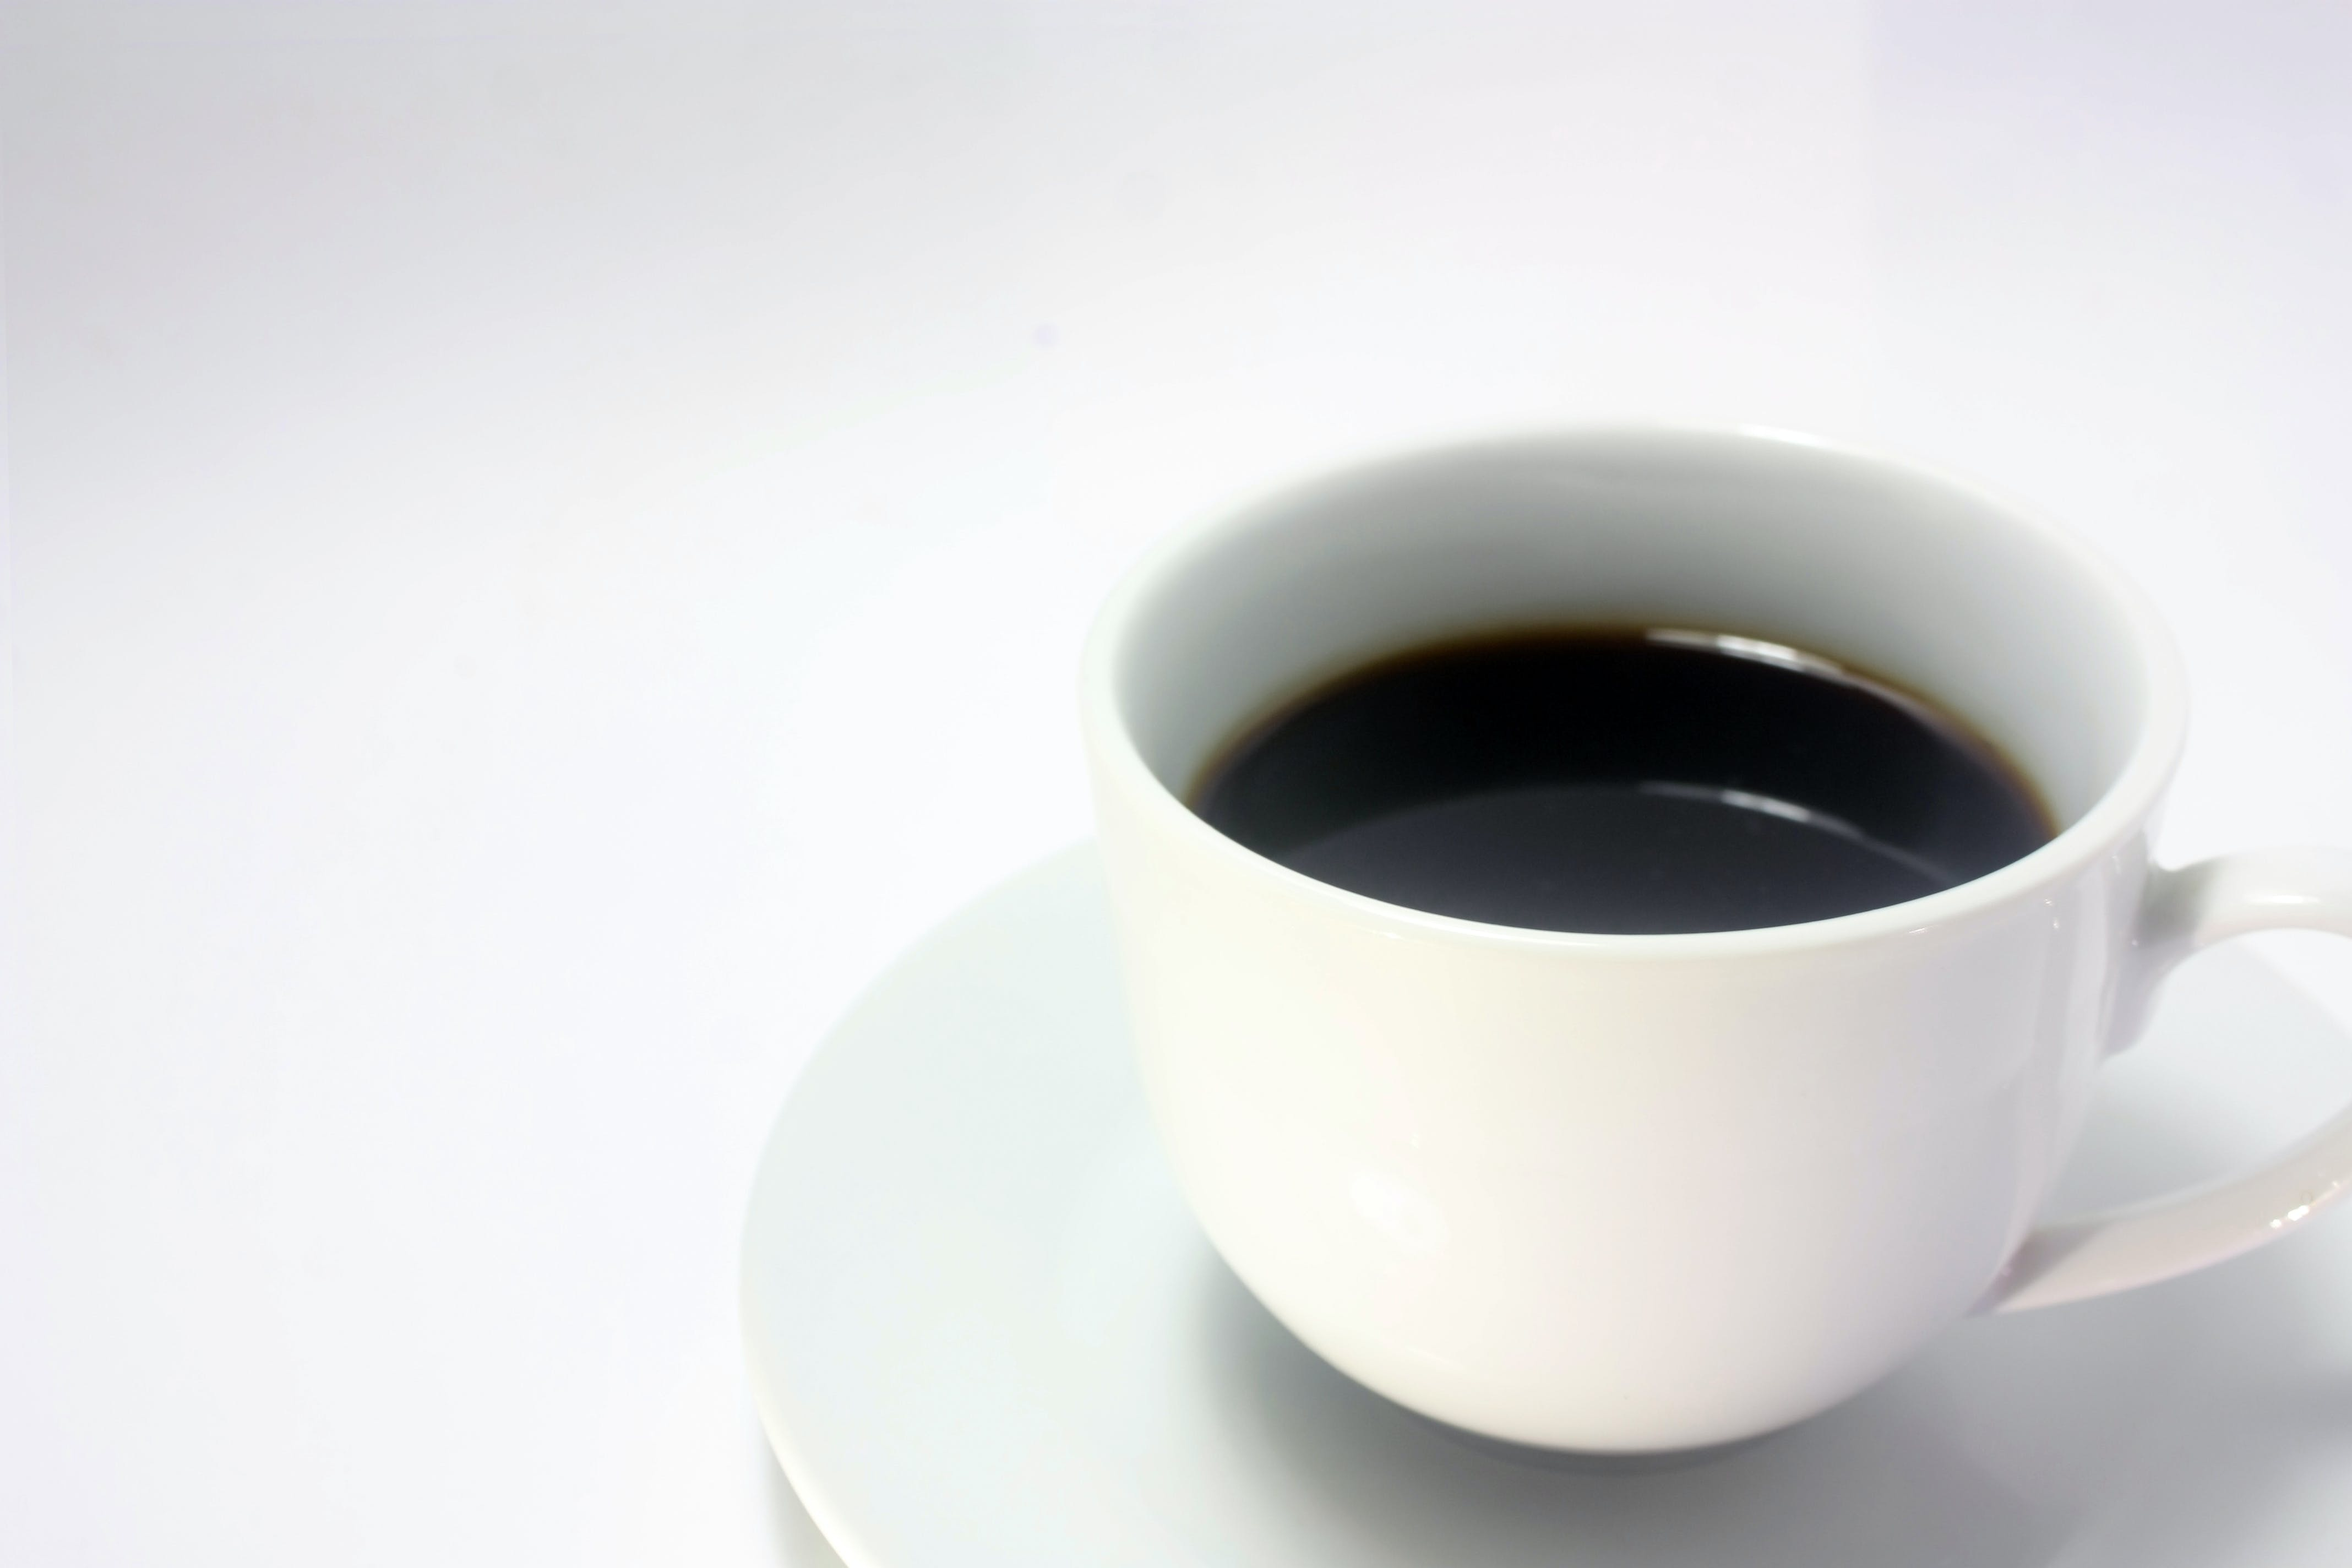 Free stock photo of coffee, café, black and white, Kaffee